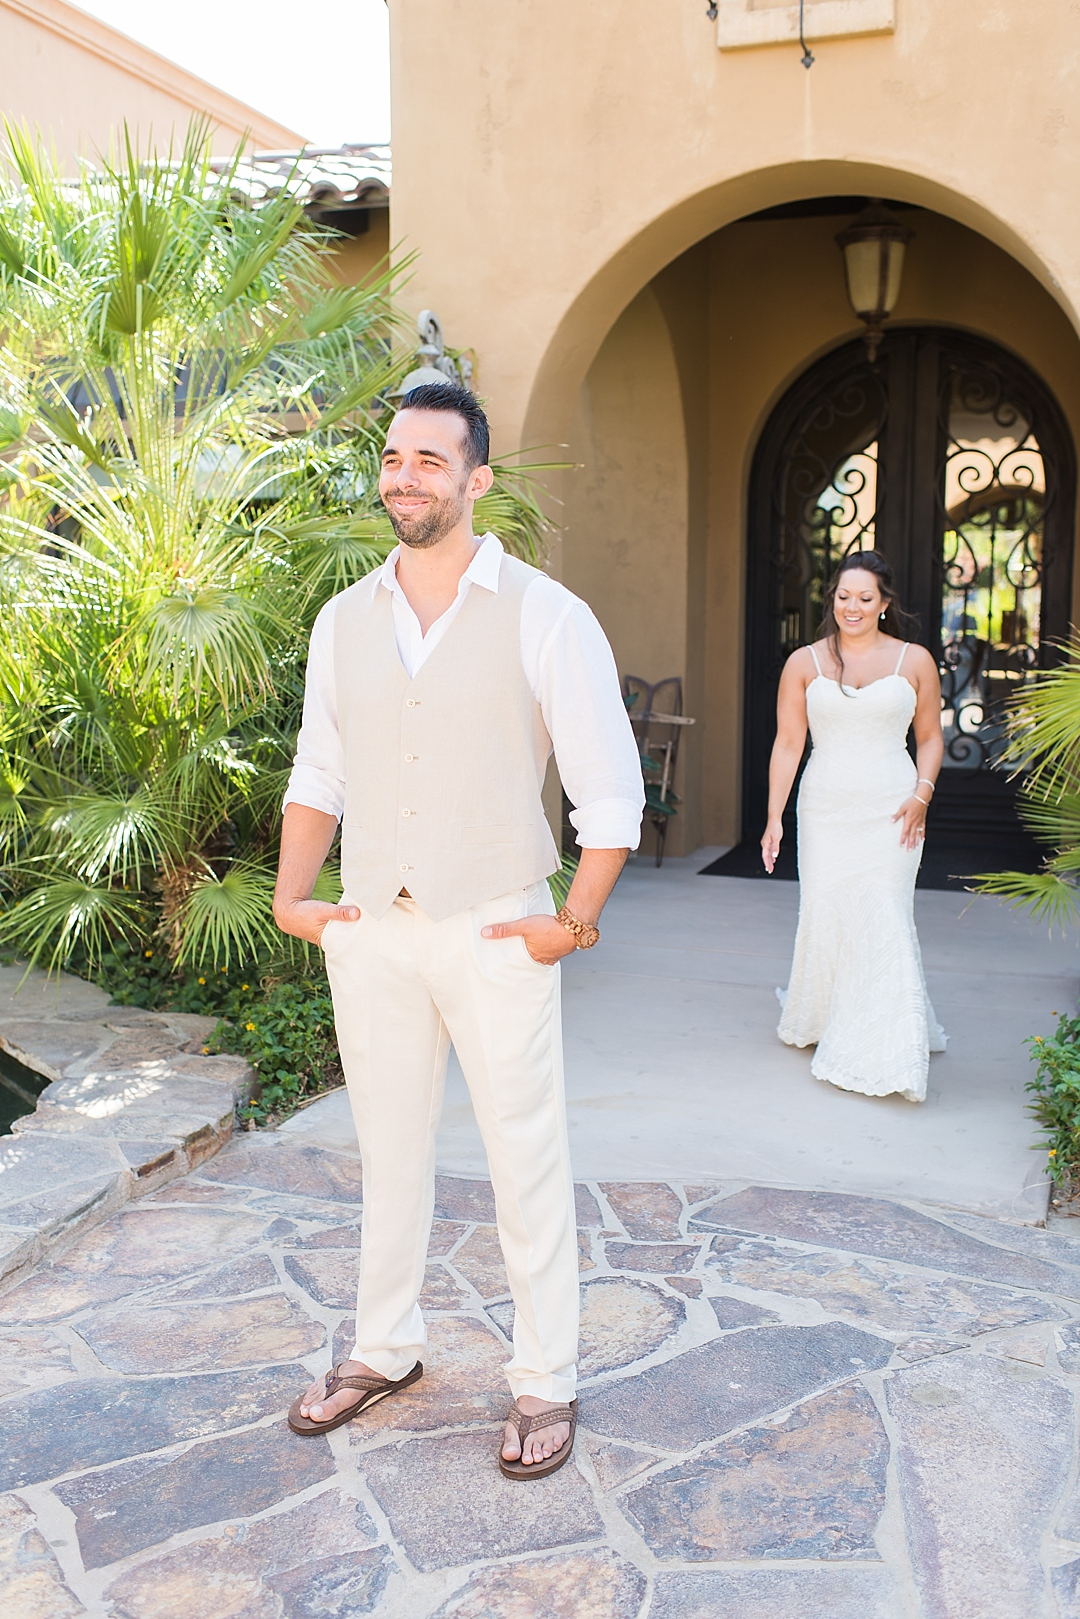 Laguna Seca Bermuda Dunes Wedding - Randy and Ashley Studios-1_WEB.jpg